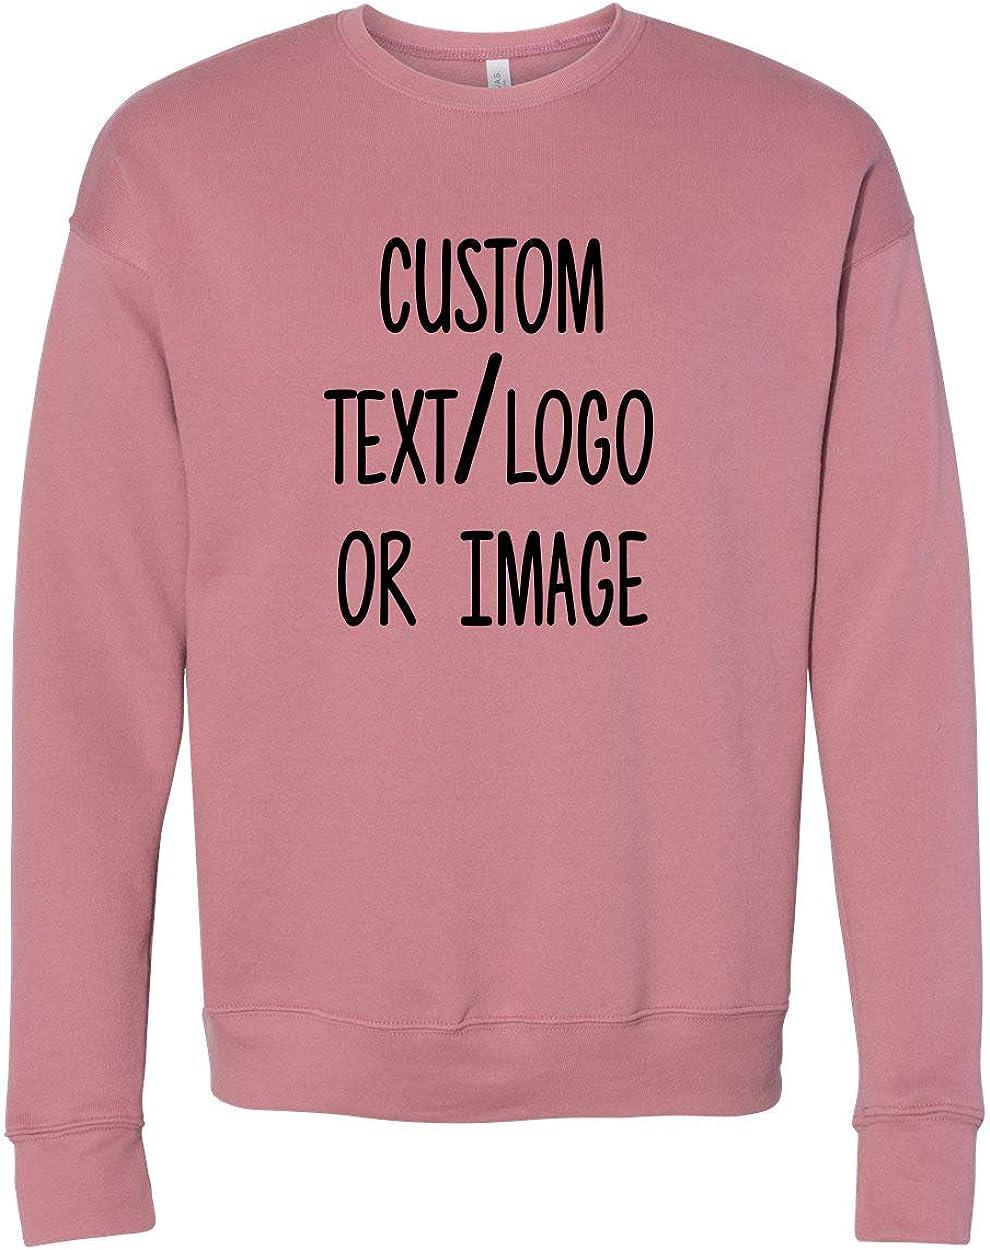 INK STITCH Unisex Sponge Fleece Design Your Own Customized Sweatshirts Custom Long Sleeve Tees - 15 Colors